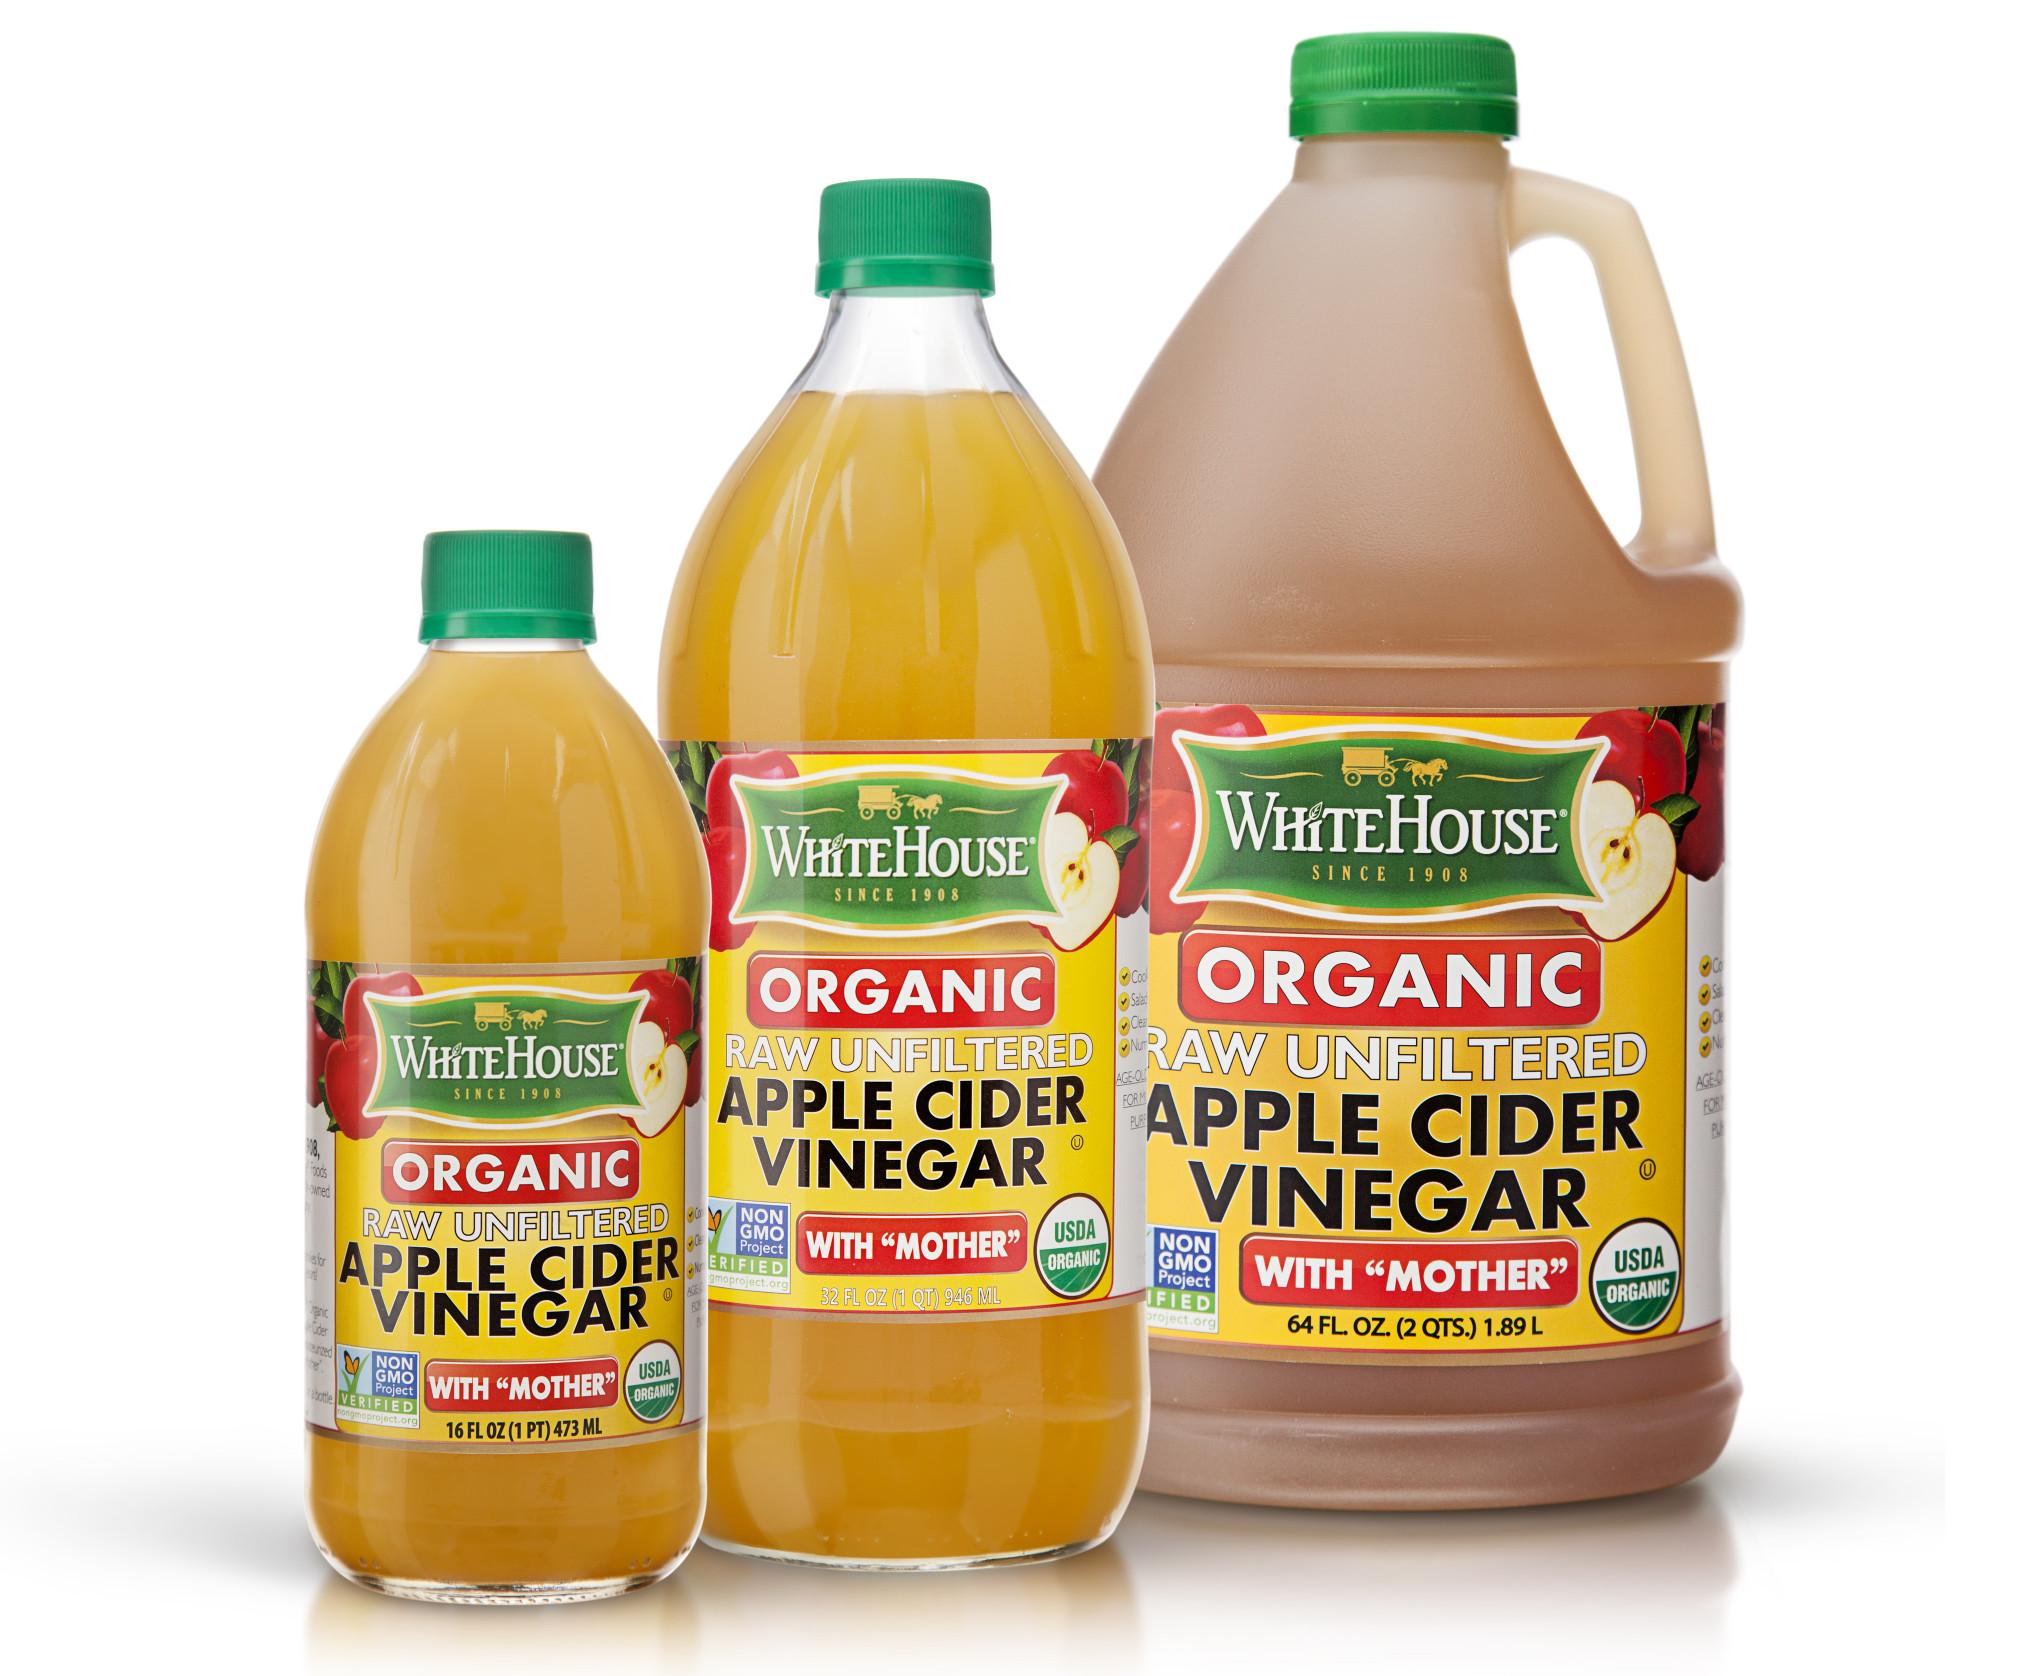 Apple Cider Vinegar  White House Organic Apple Cider Vinegar with Mother